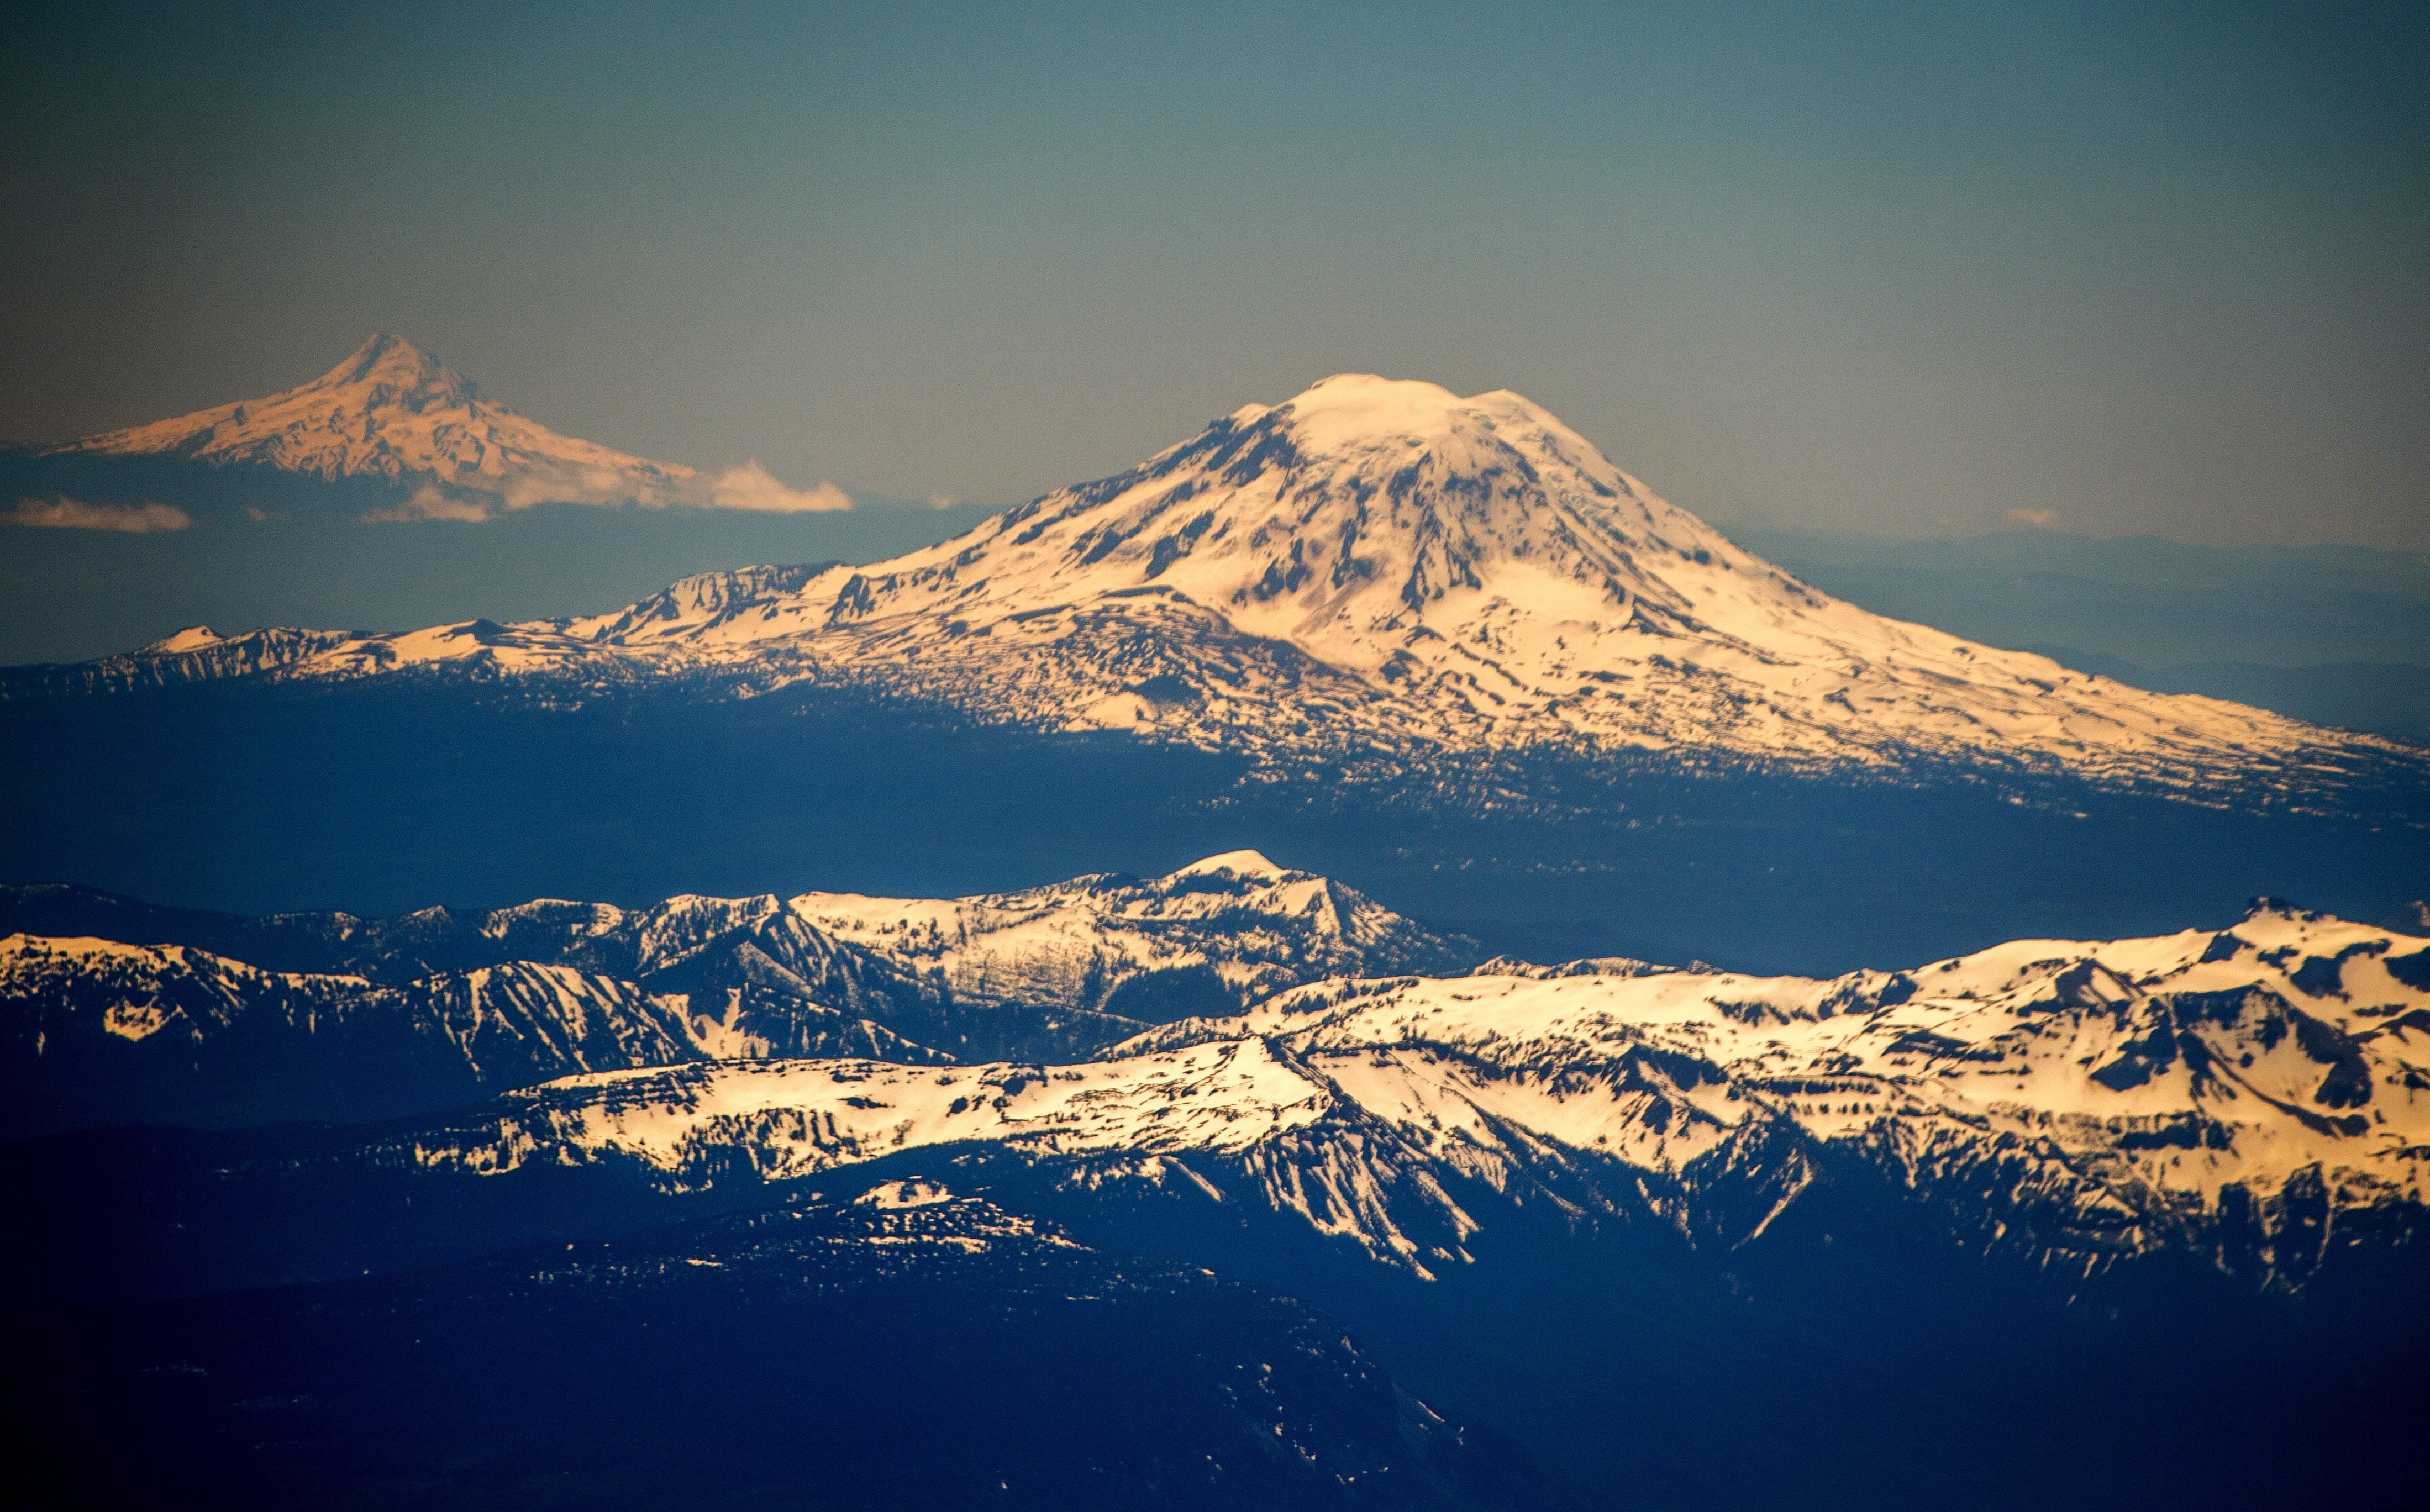 Earthquake swarm detected beneath Mount St. Helens - CBS News